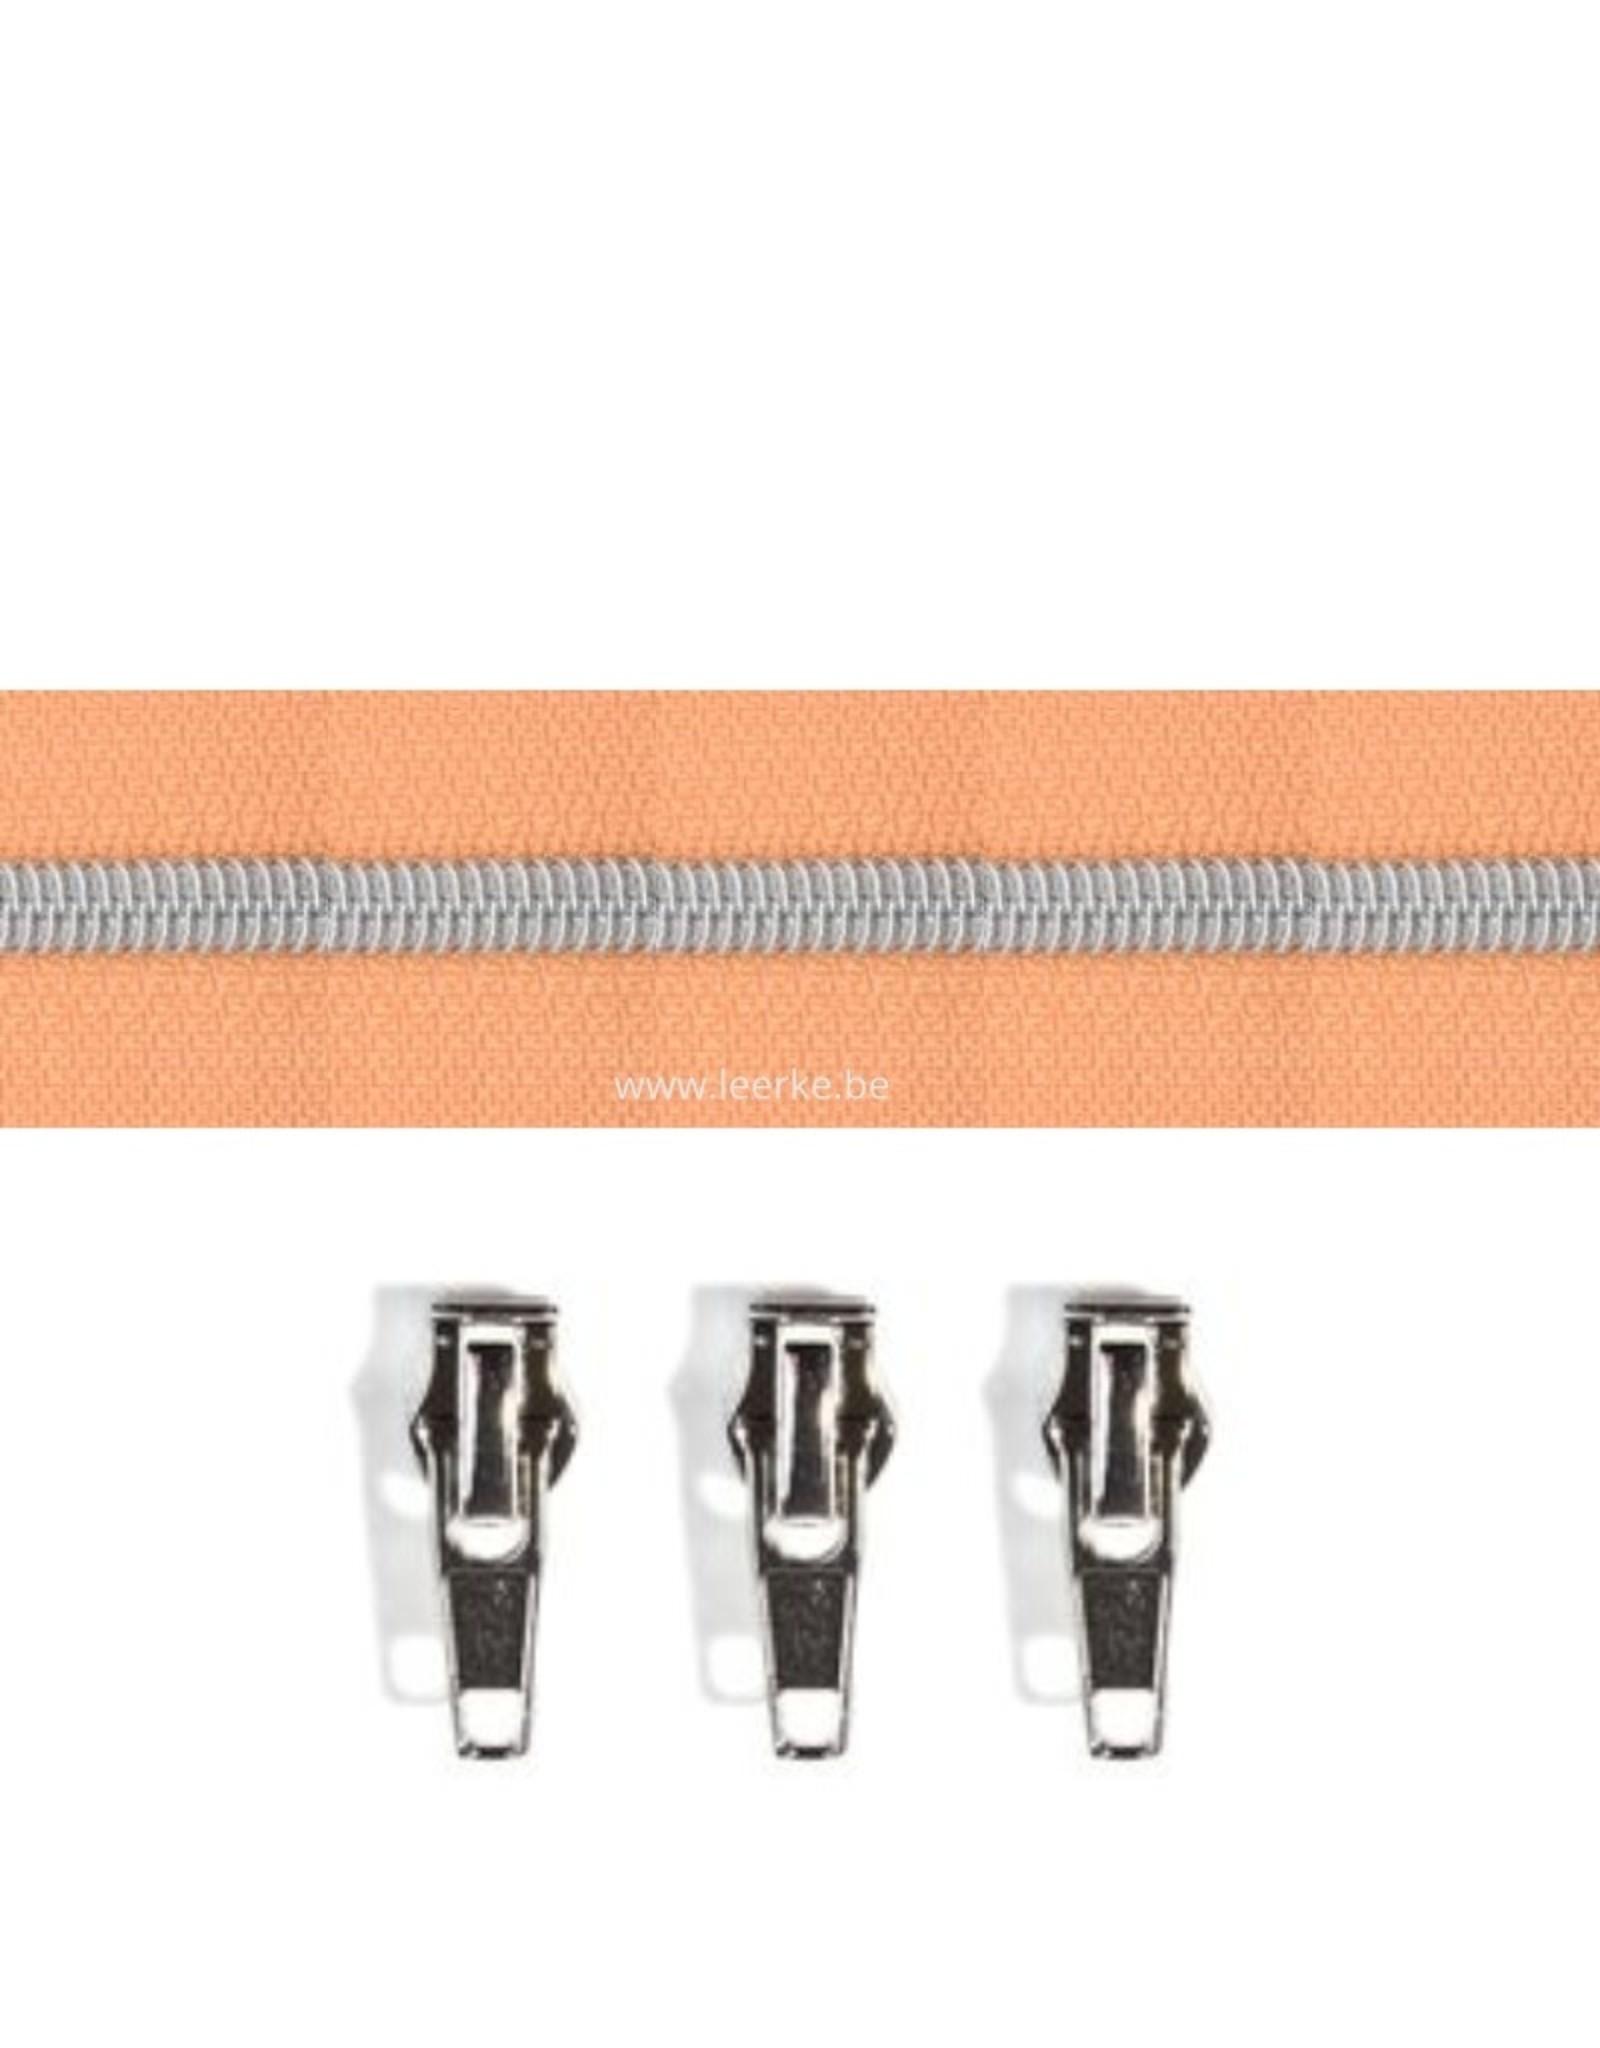 Rits per meter (incl. 3 trekkers) - Zilver- Abrikoos- Size 6,5